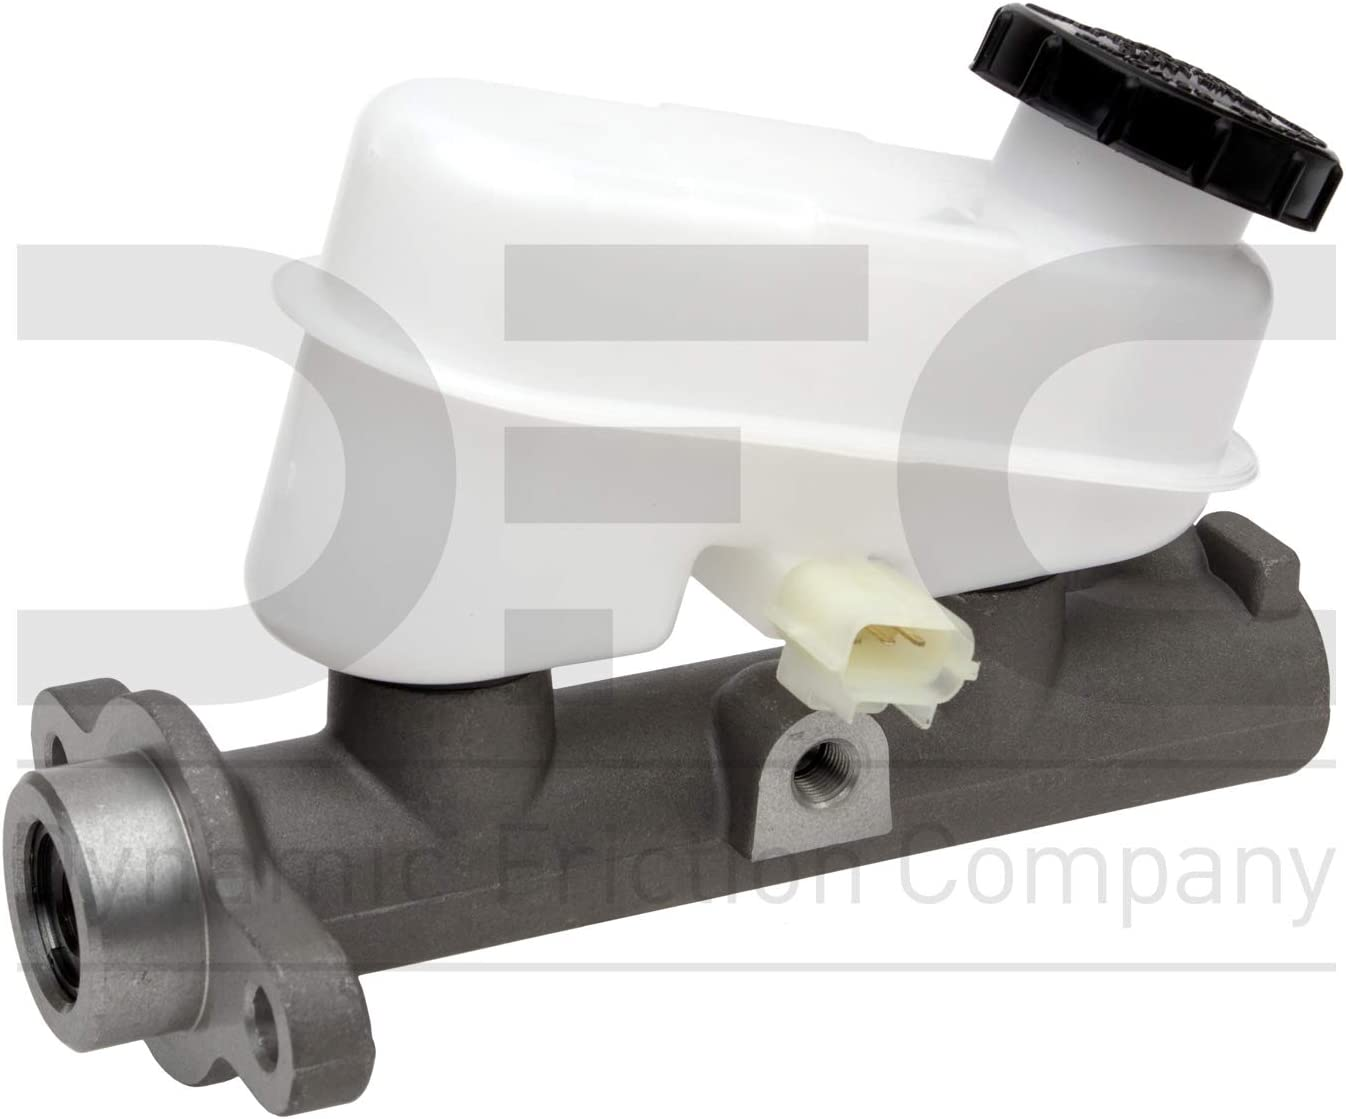 Dynamic Friction Company 2021 new Brake 35% OFF Cylinder 355-54069 Master